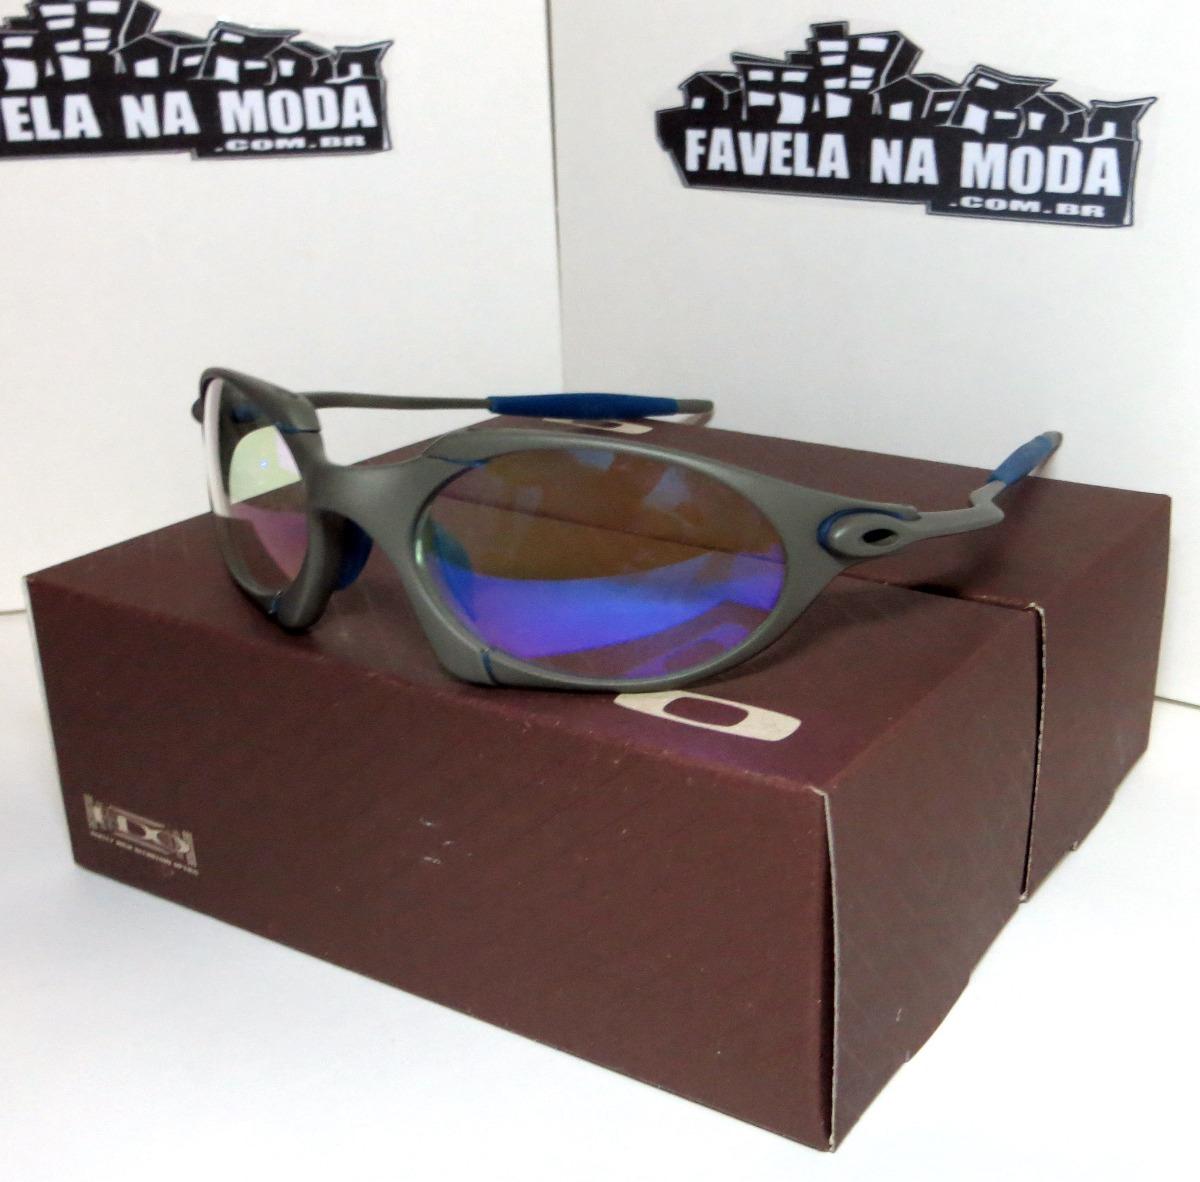 abc506161dd36 óculos oakley romeo 1   xmetal   clear azul + par de lentes. Carregando  zoom.